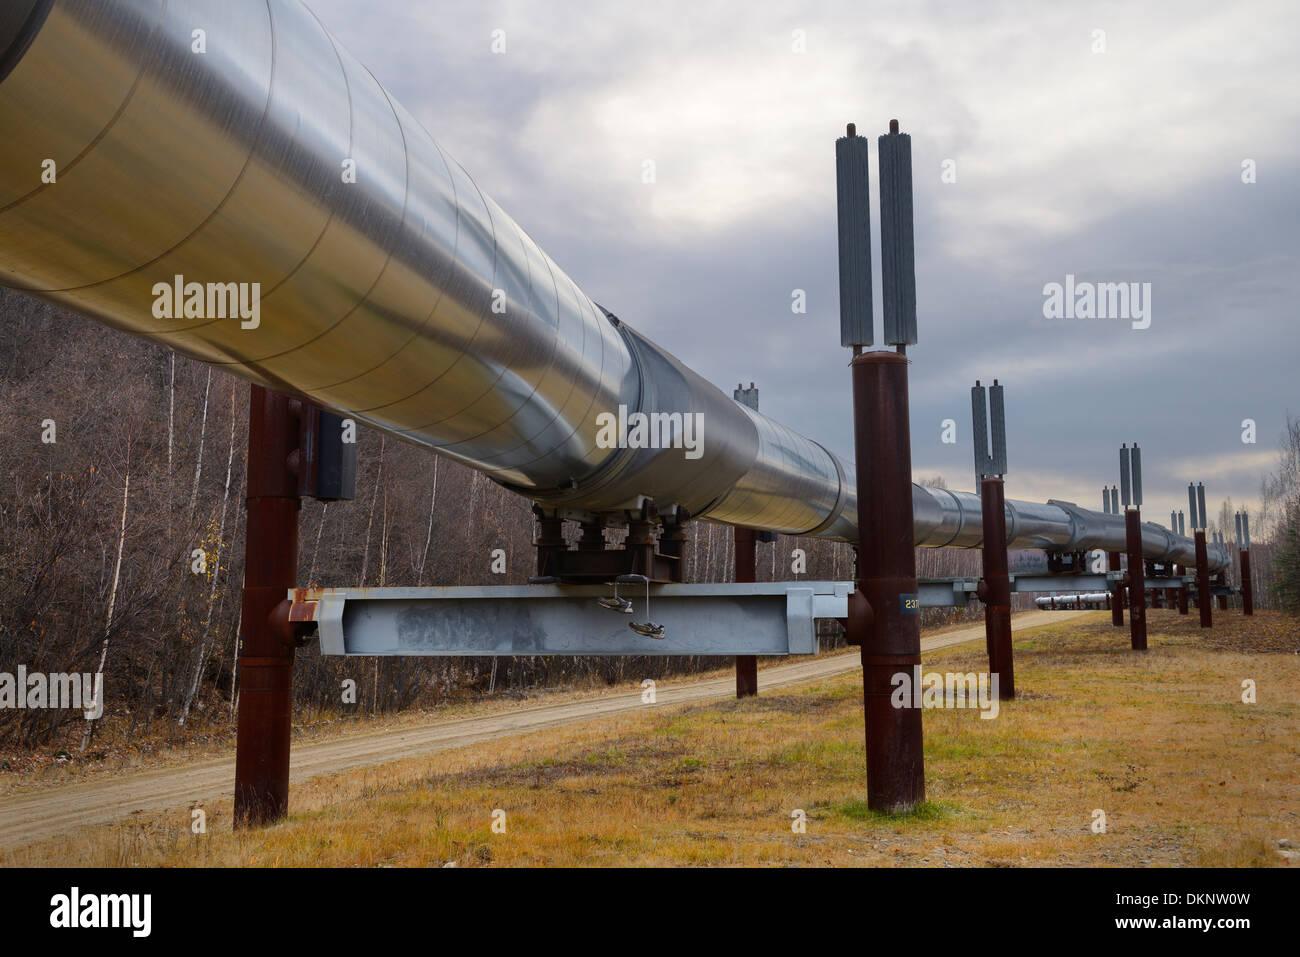 Alyeska elevated Trans Alaska Oil Pipeline system with passive refrigeration columns near Fairbanks Alaska USA - Stock Image